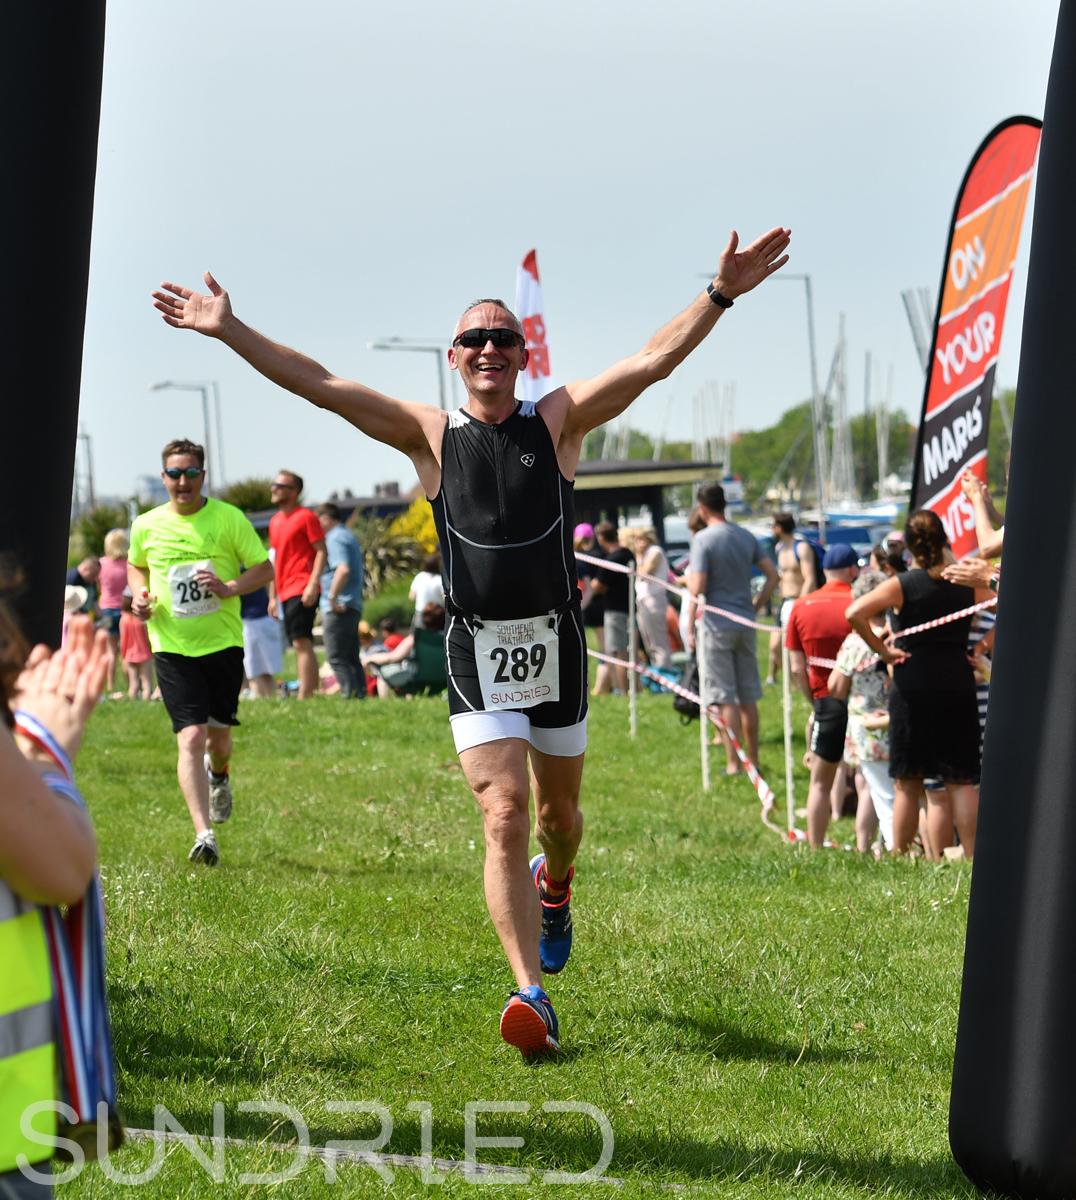 Sundried-Southend-Triathlon-2017-May-0162.jpg